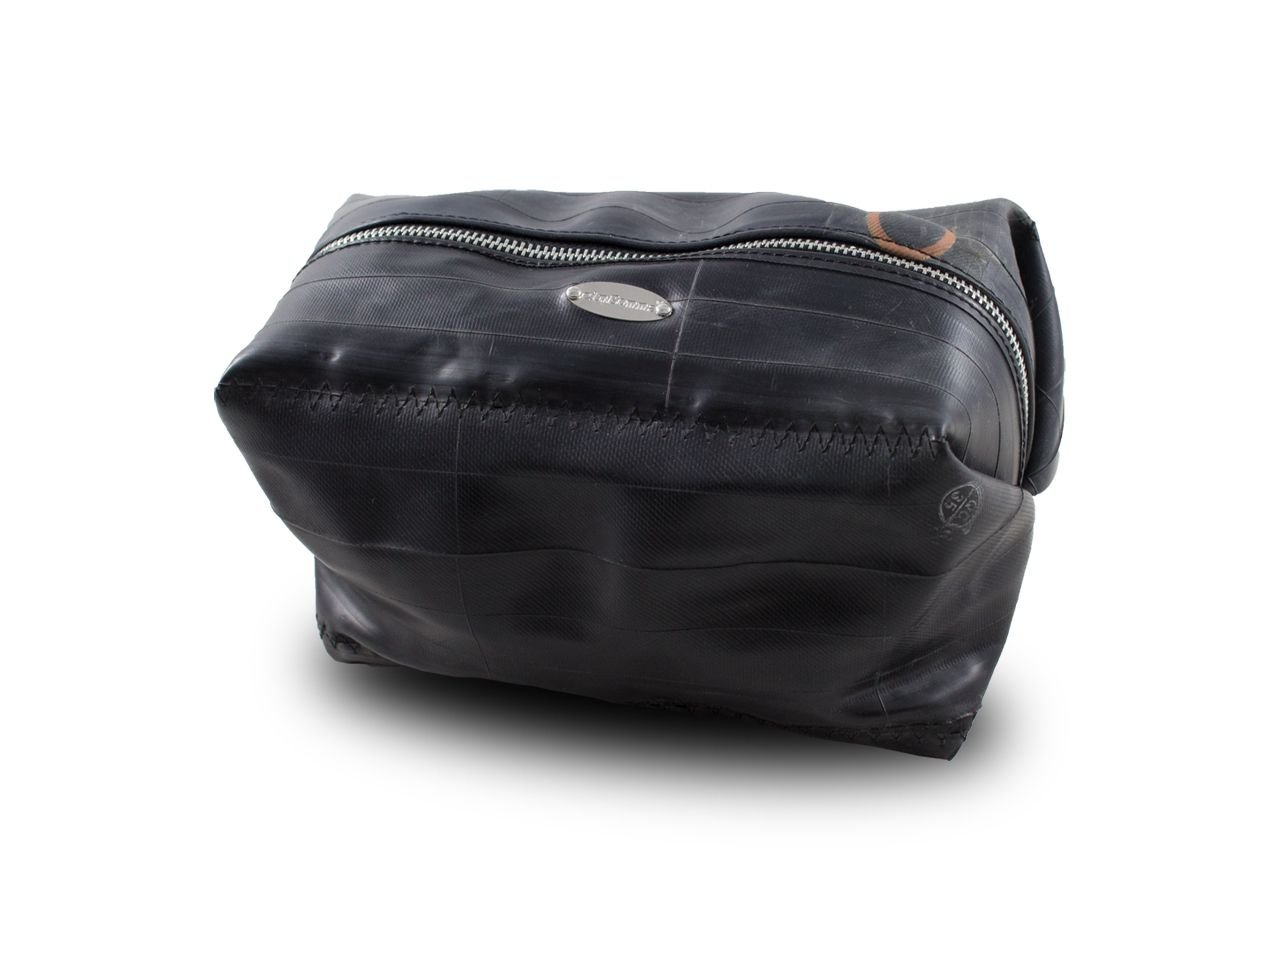 Beauty case Cingomma - v2